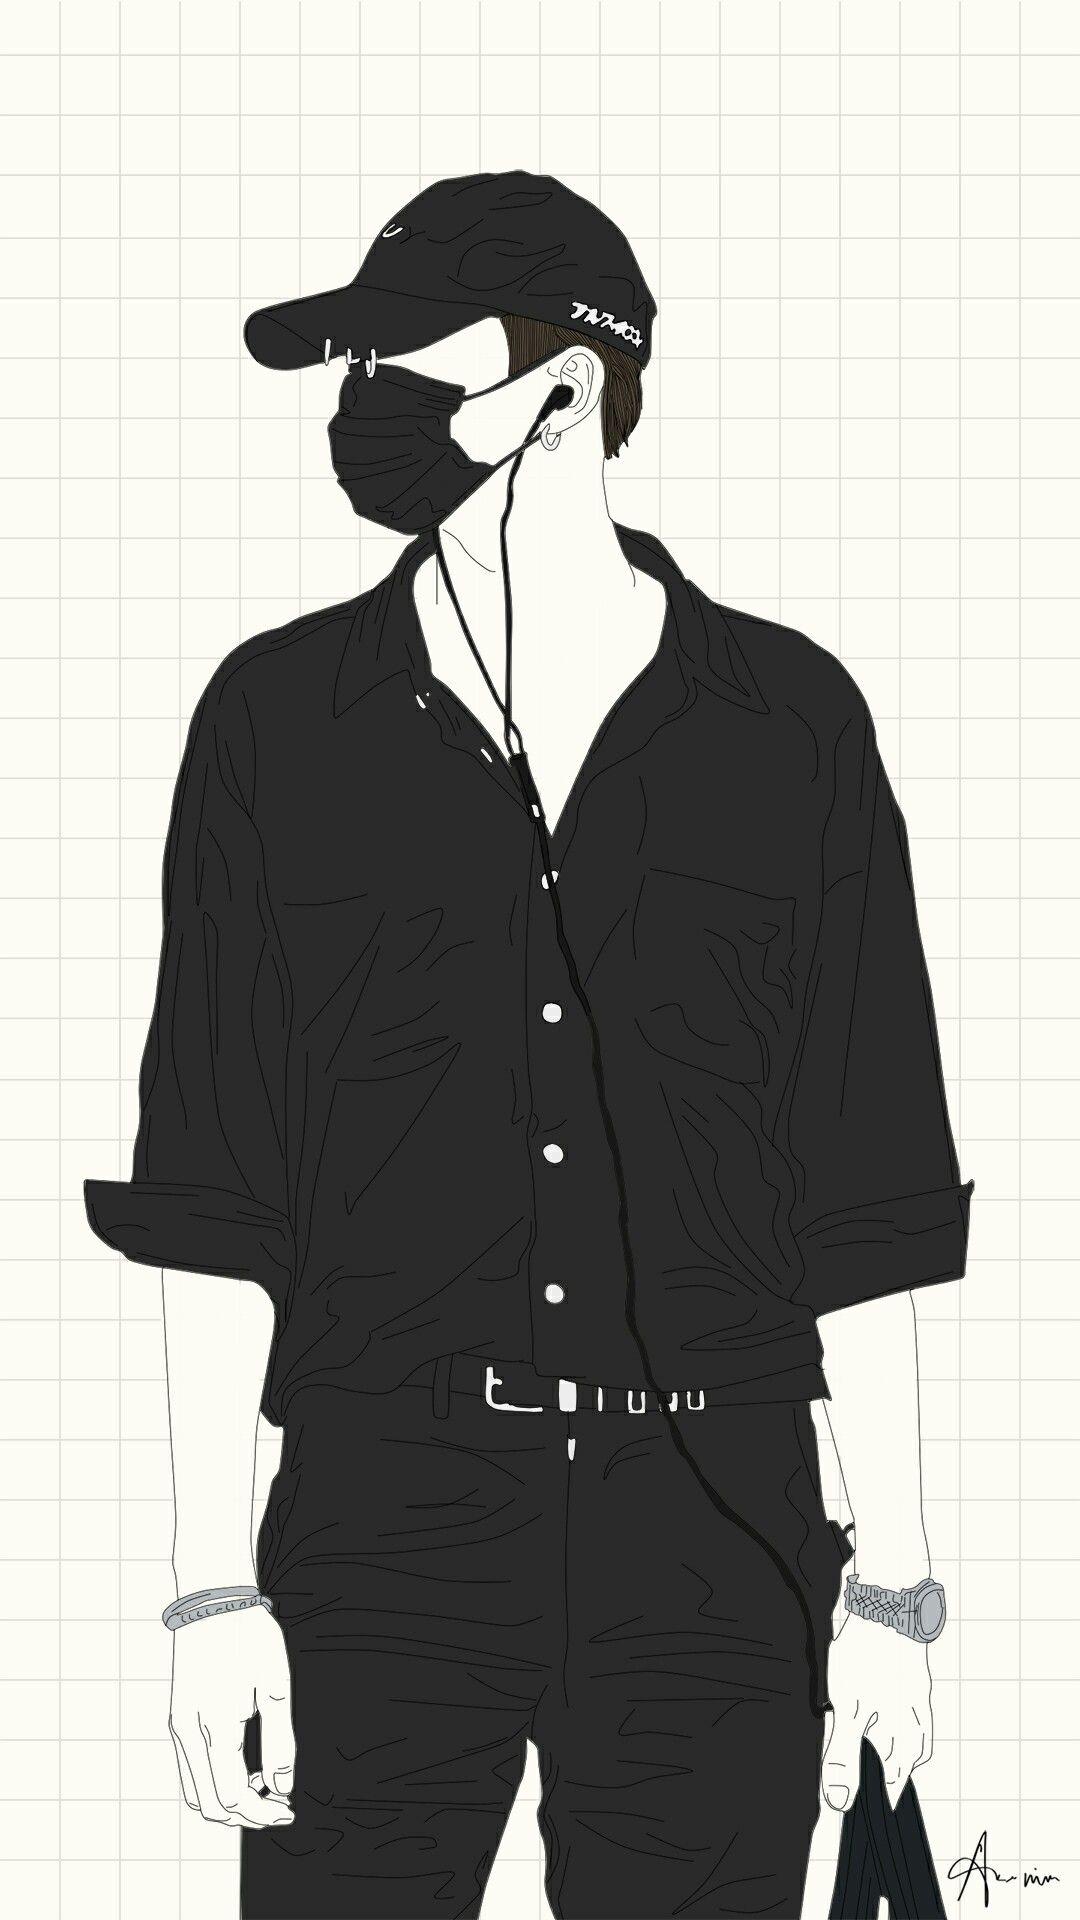 Pin by Tran Trang on Bts Pinterest BTS, Fanart and Kpop